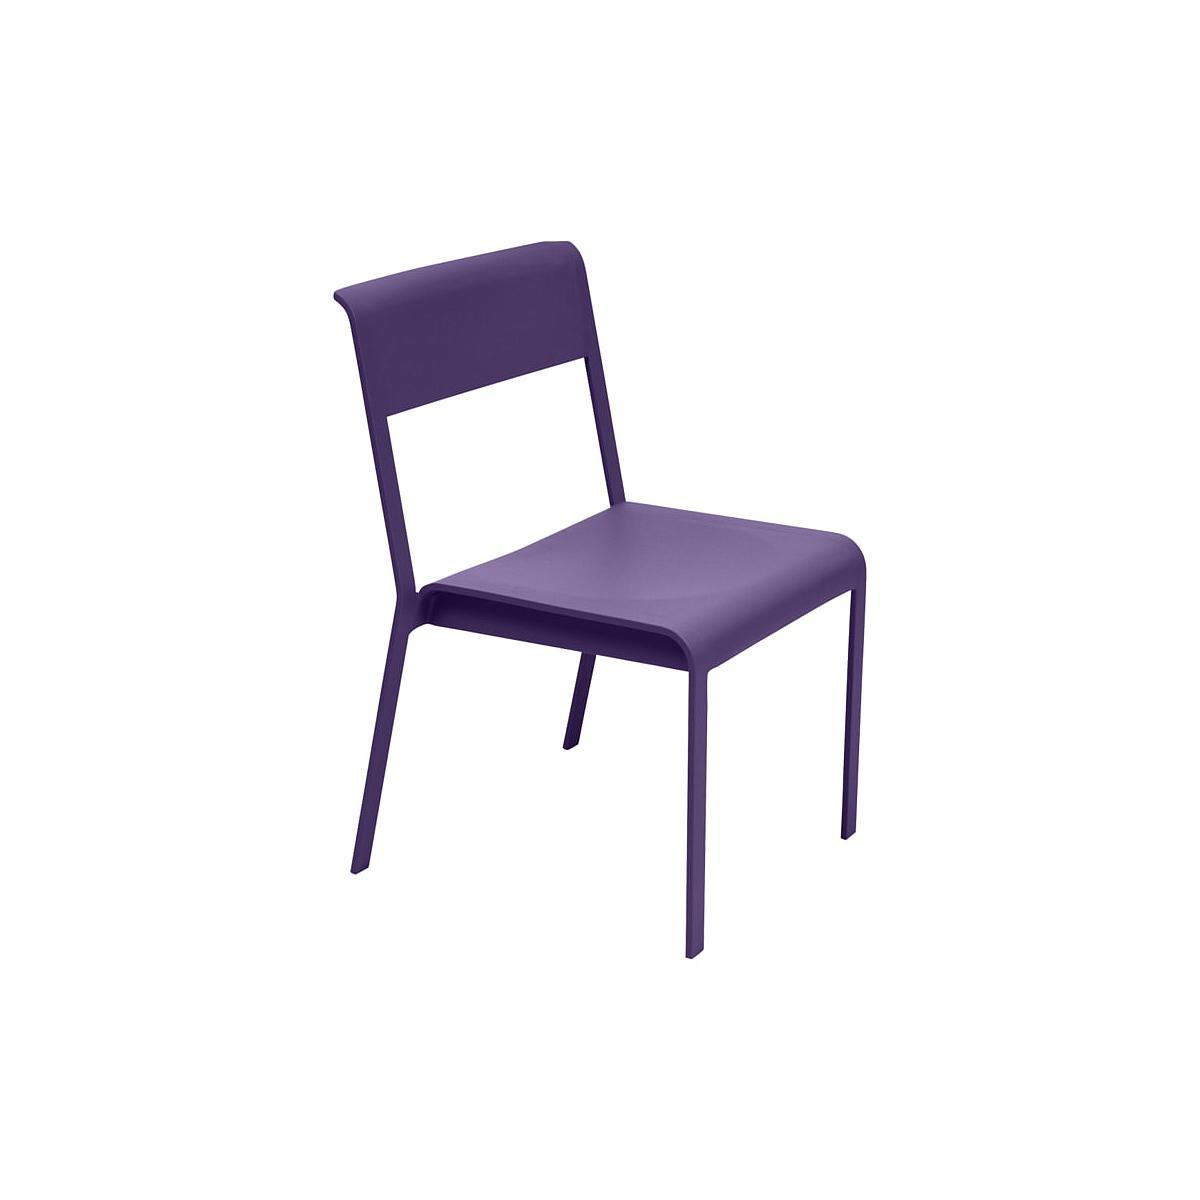 Chaise de jardin BELLEVIE Fermob aubergine | Abitare Living